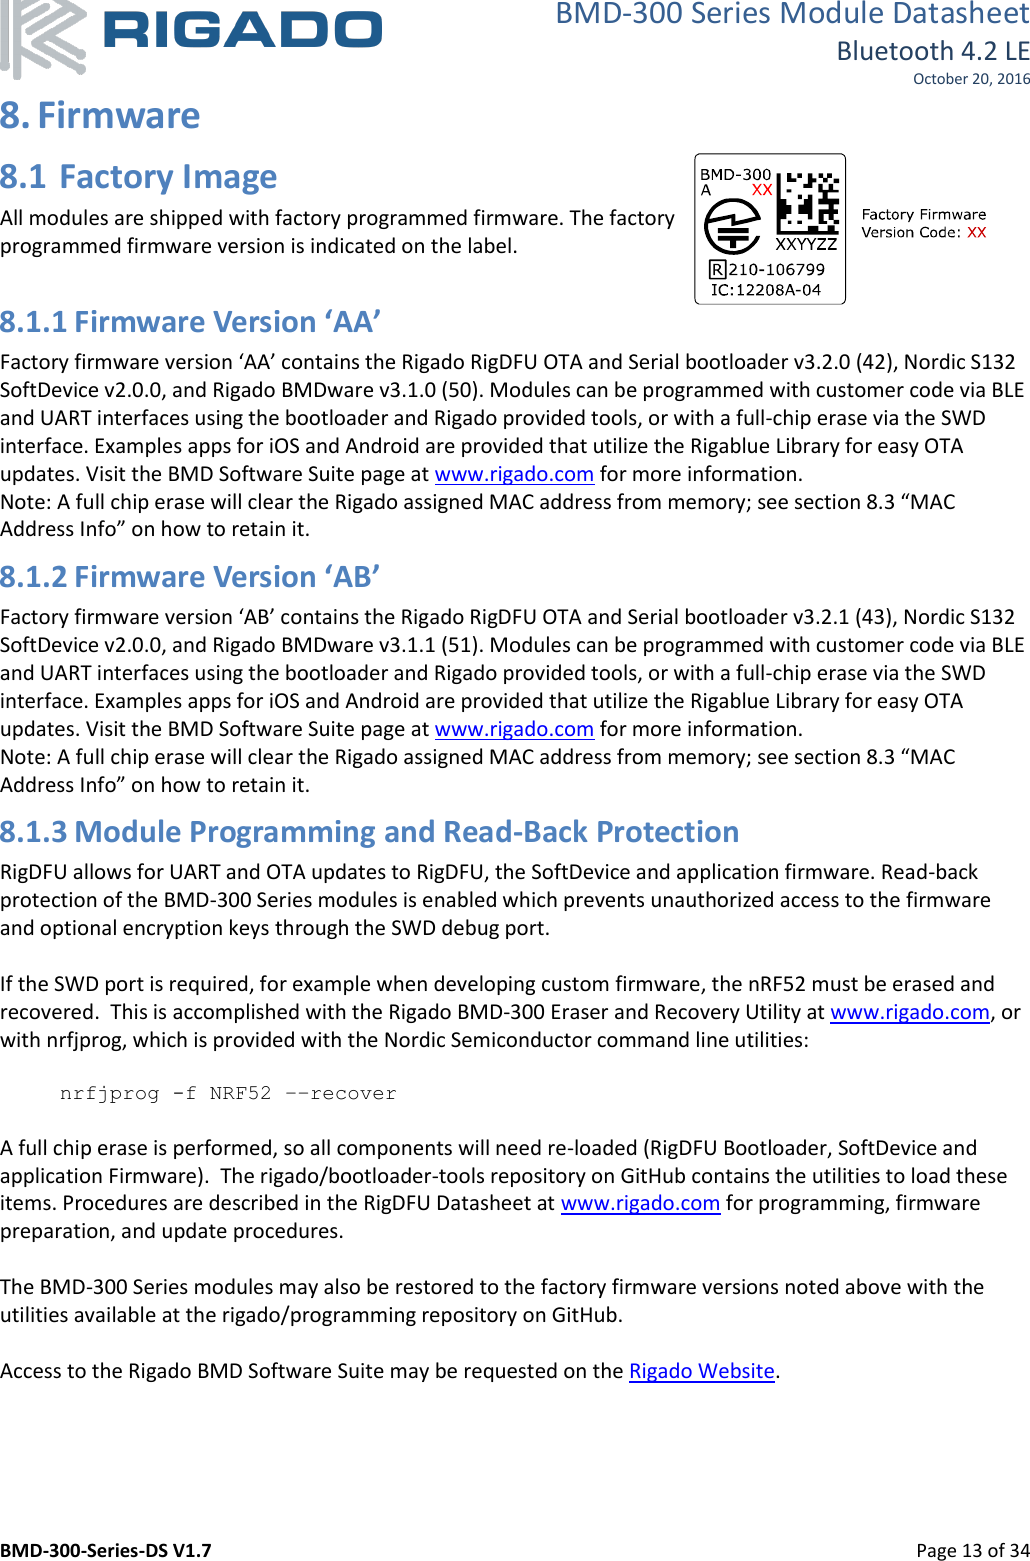 Rigado 05 BMD-350 User Manual BMD 300 Series Datasheet